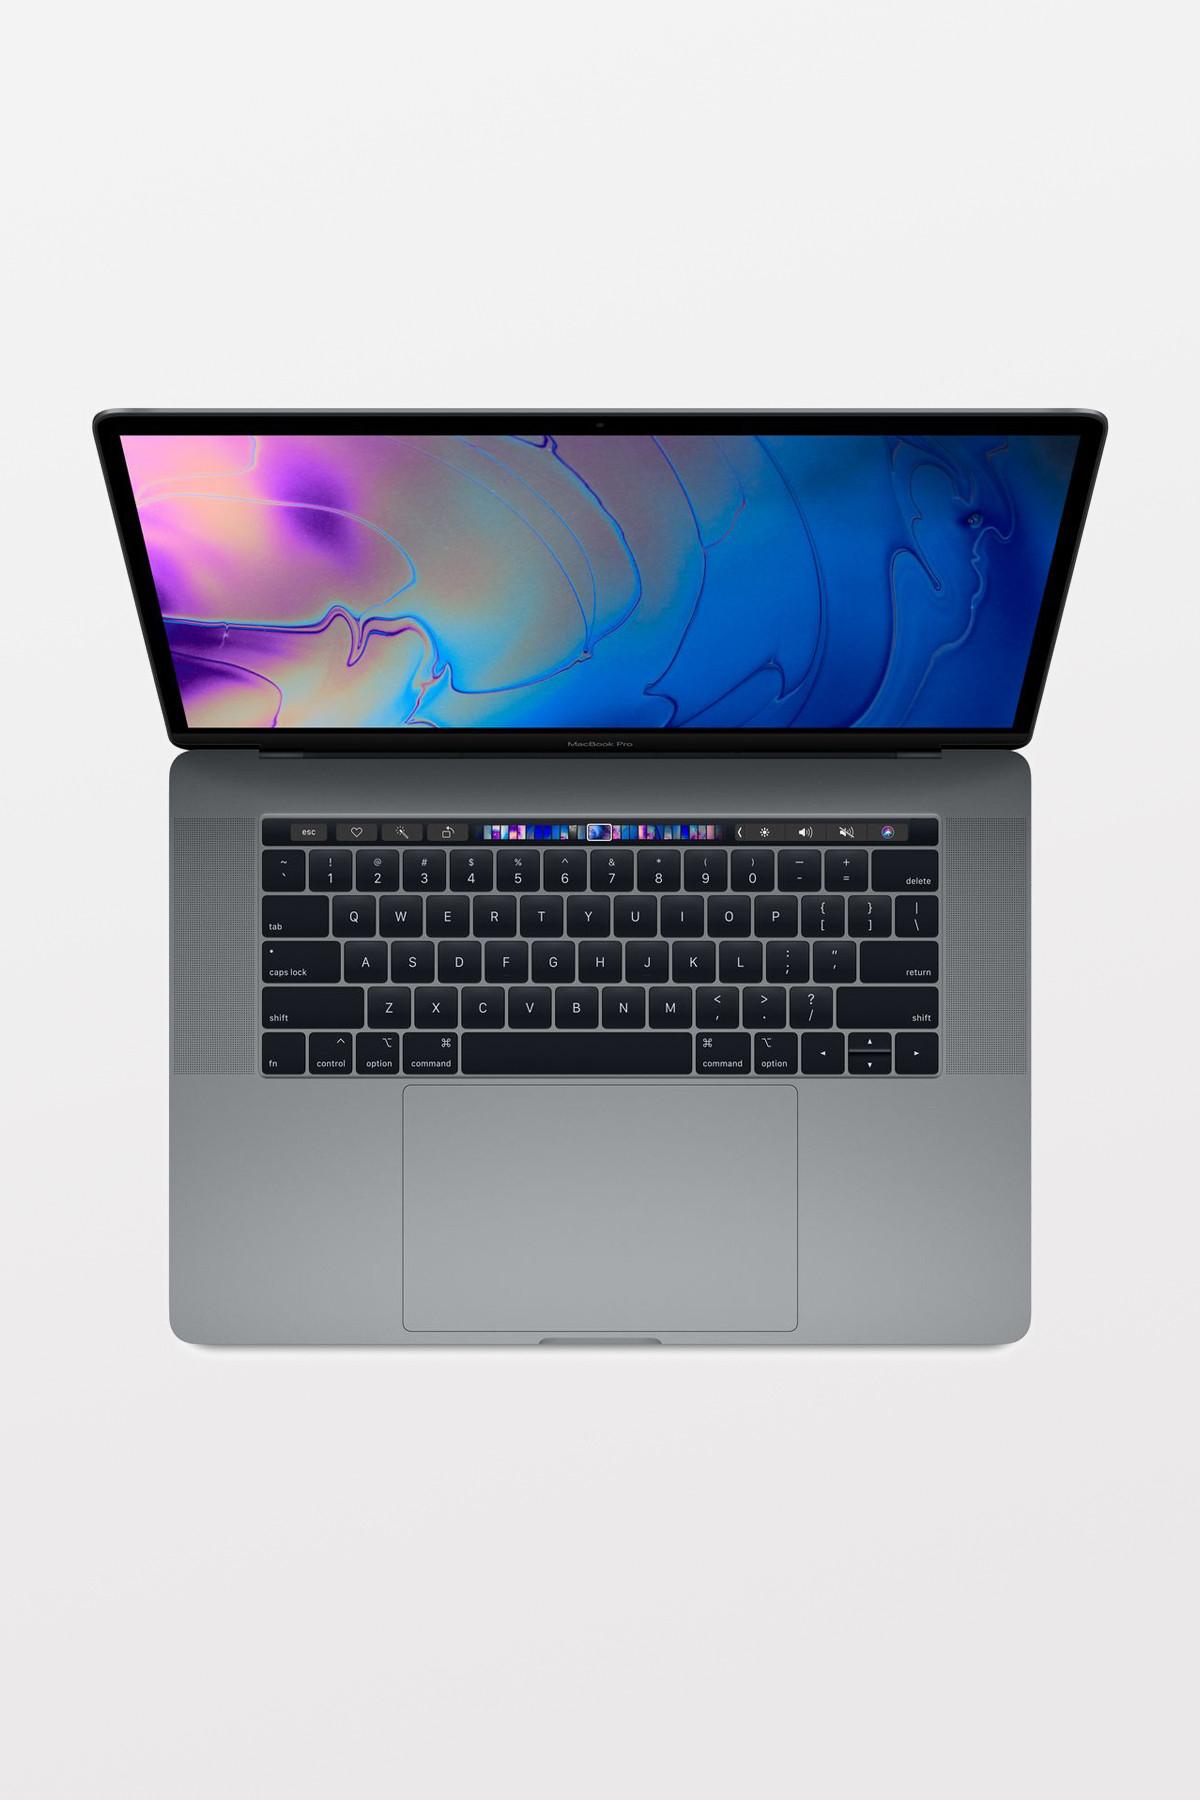 MacBook Pro 15.4 SG/2.4GHz 9th gen/32GB/1TB SSD/Radeon Pro 560X with 4GB - Refurbished